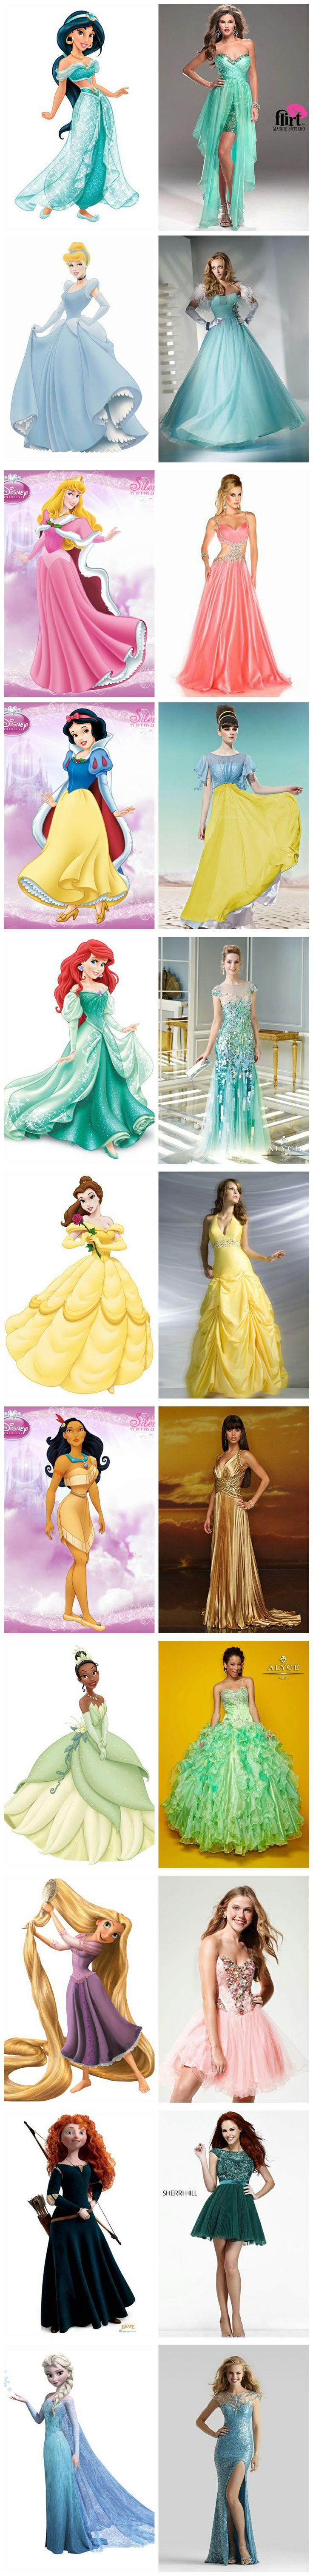 Disney Princess's Dresss